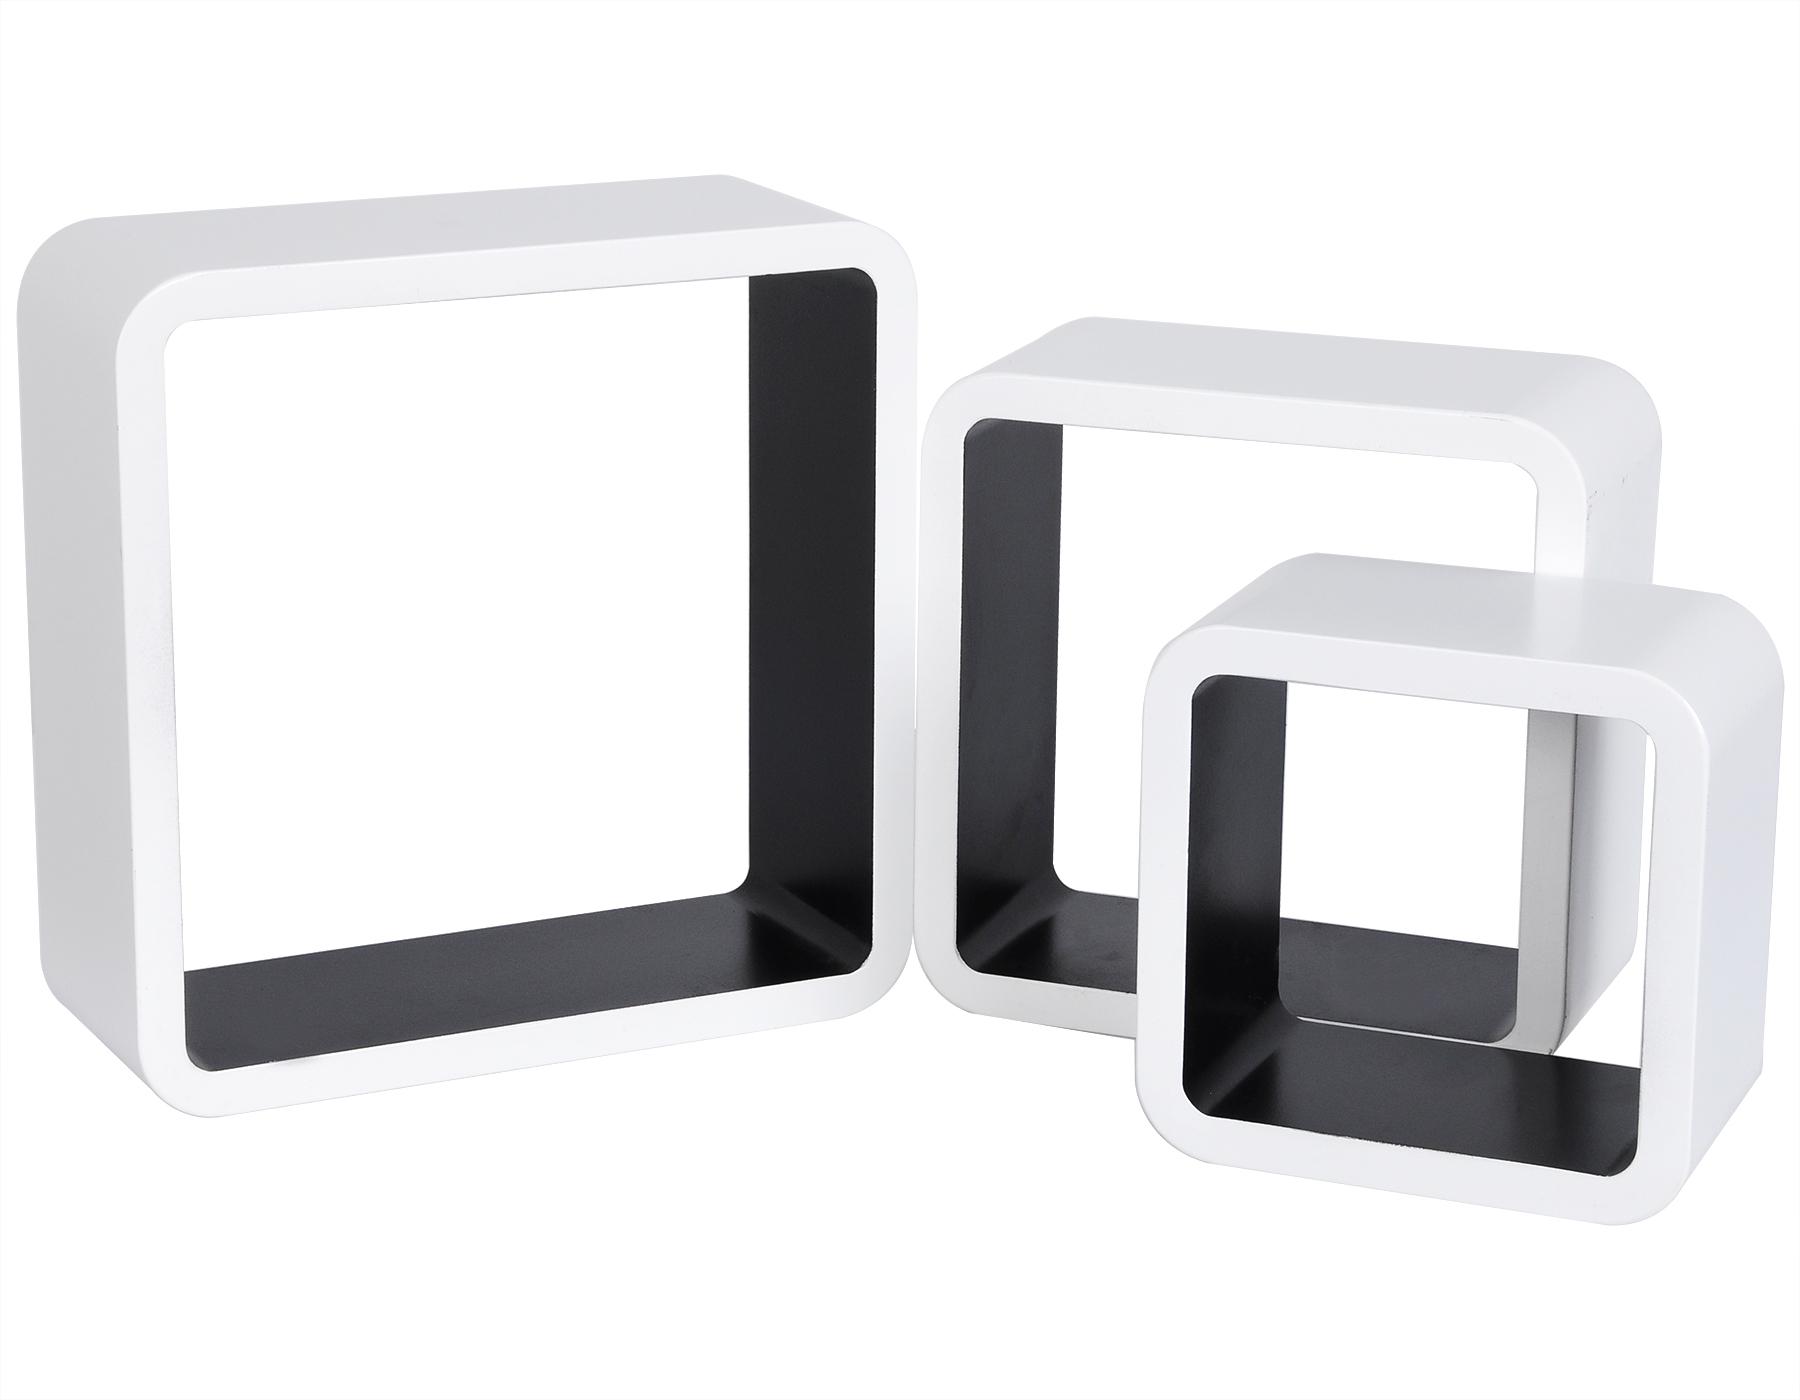 wandregal b roregal h ngeregal holz mdf wandboard cube lounge cd regal e056 ebay. Black Bedroom Furniture Sets. Home Design Ideas